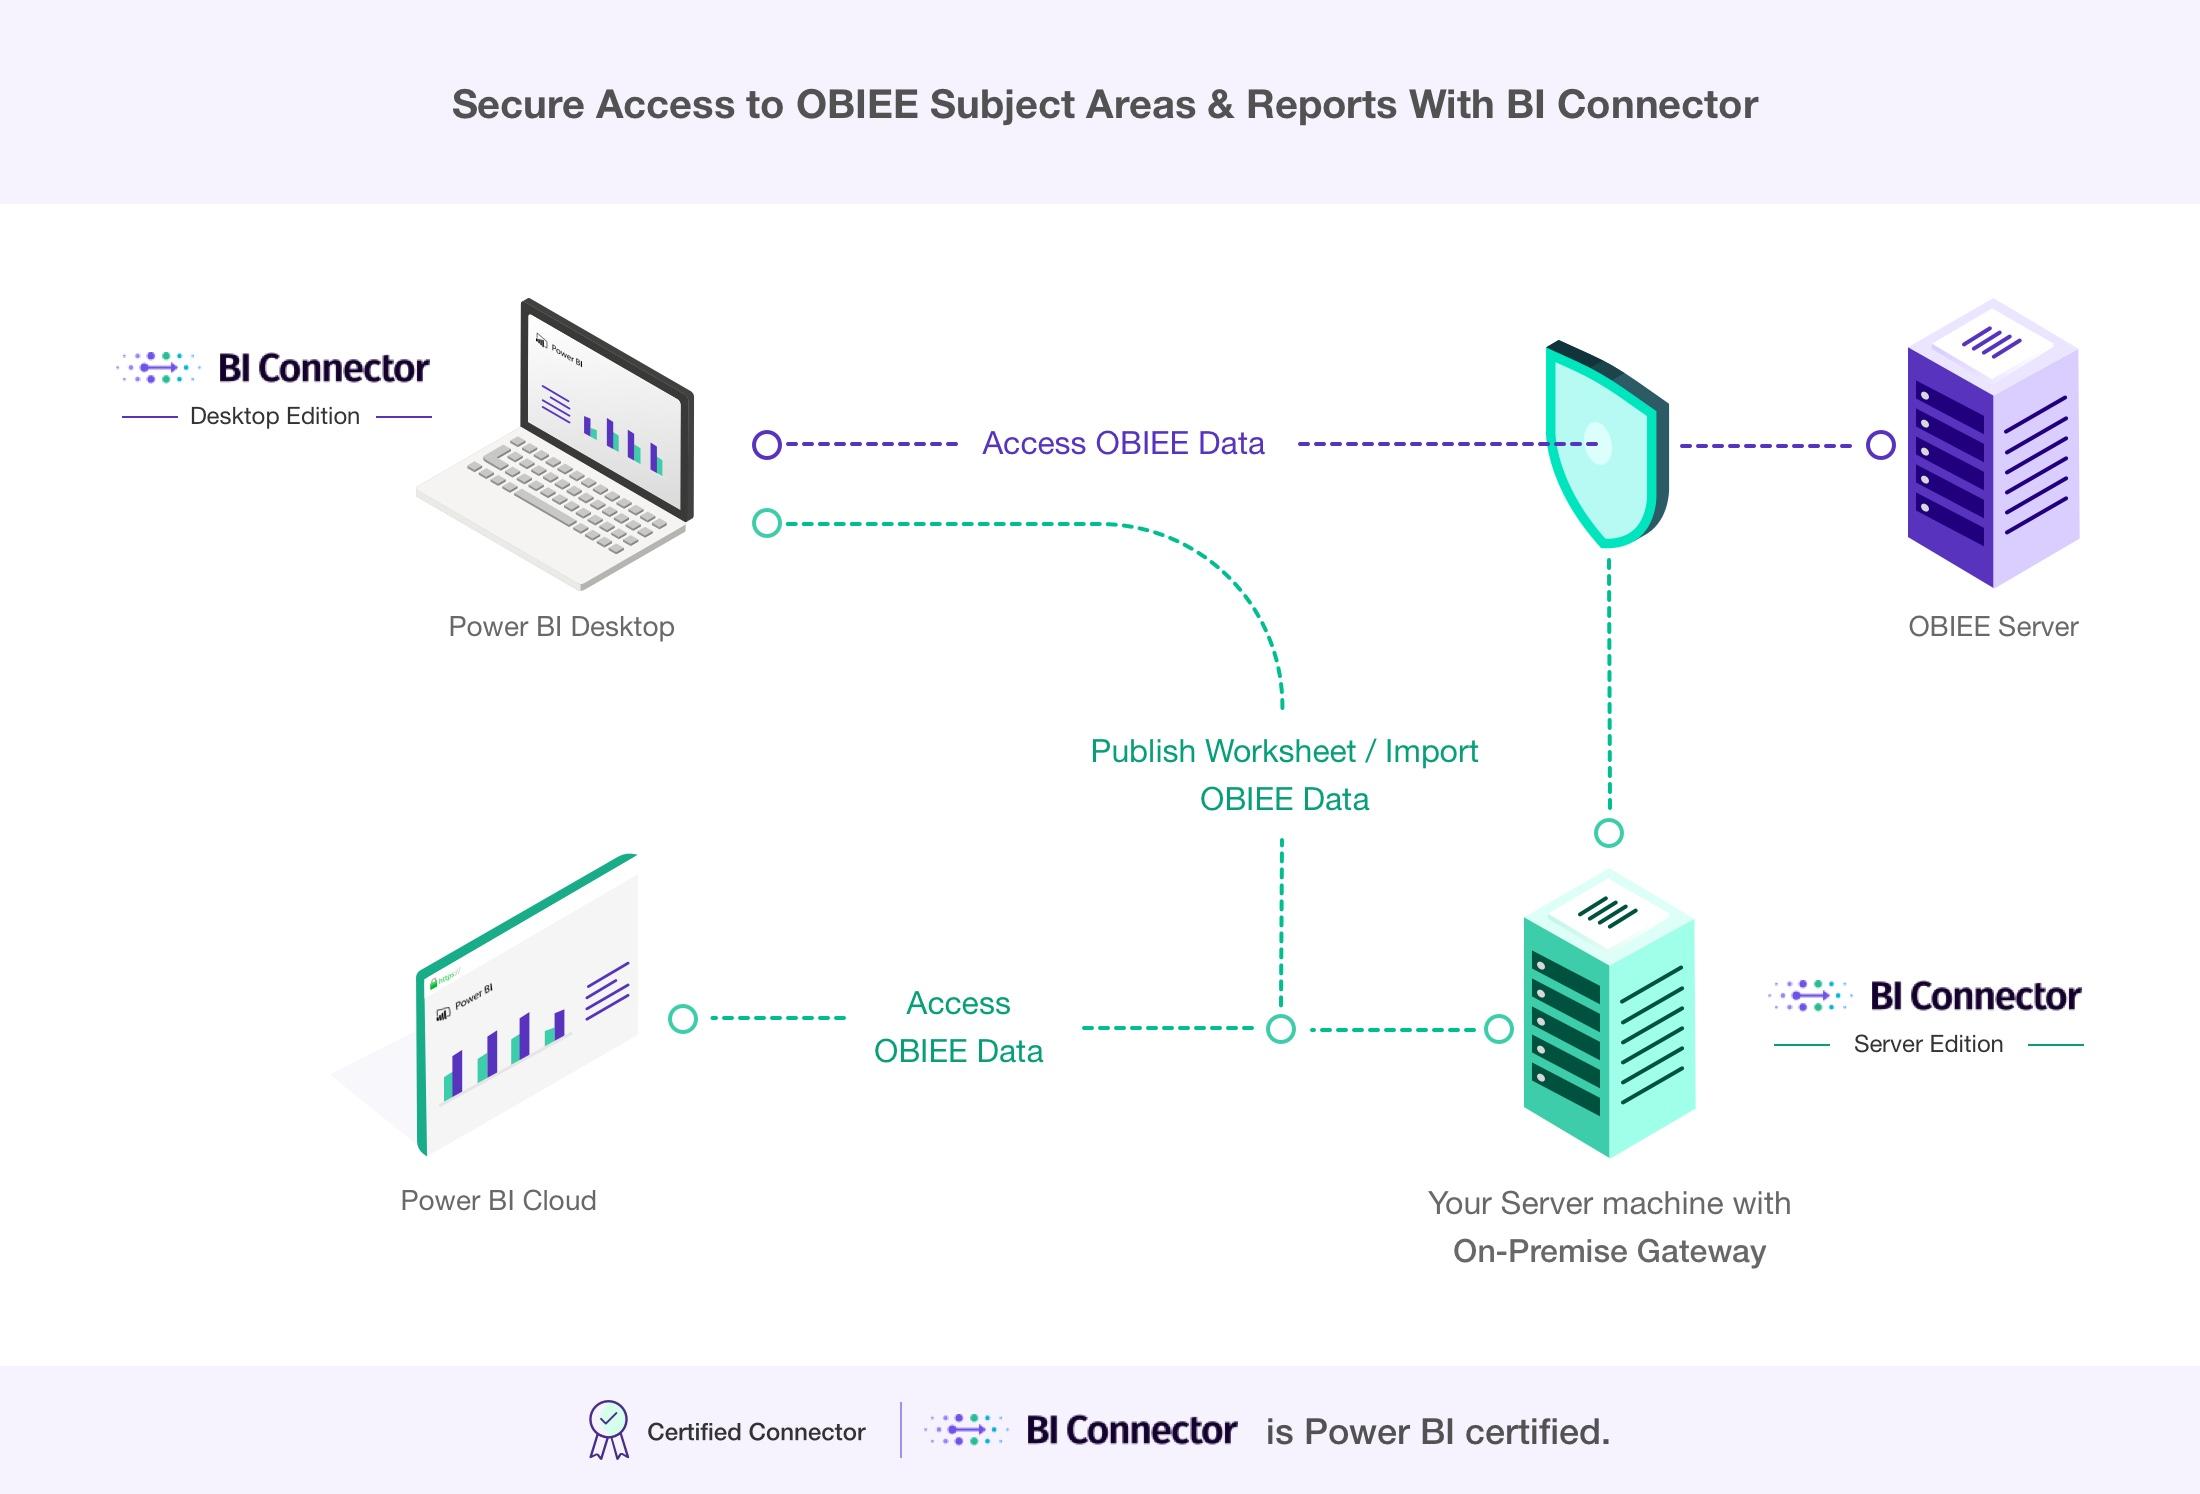 Reference Architecture Power BI to OBIEE via BI Connector